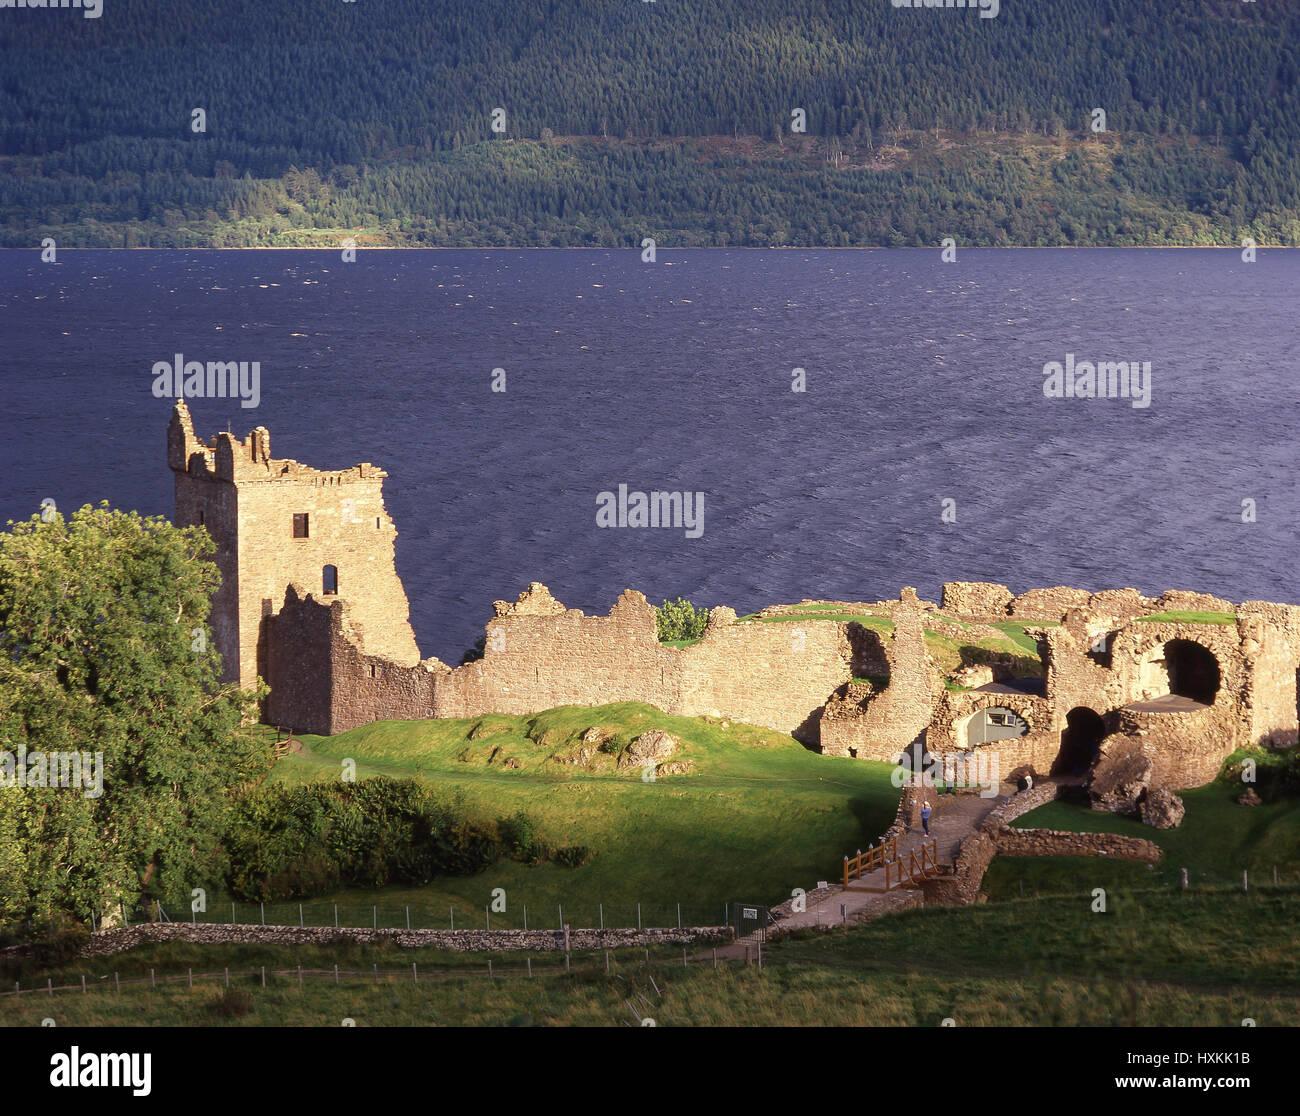 Urquhart Castle on Loch Ness, Nr. Drumnadrochit, Highland, Scotland, United Kingdom - Stock Image